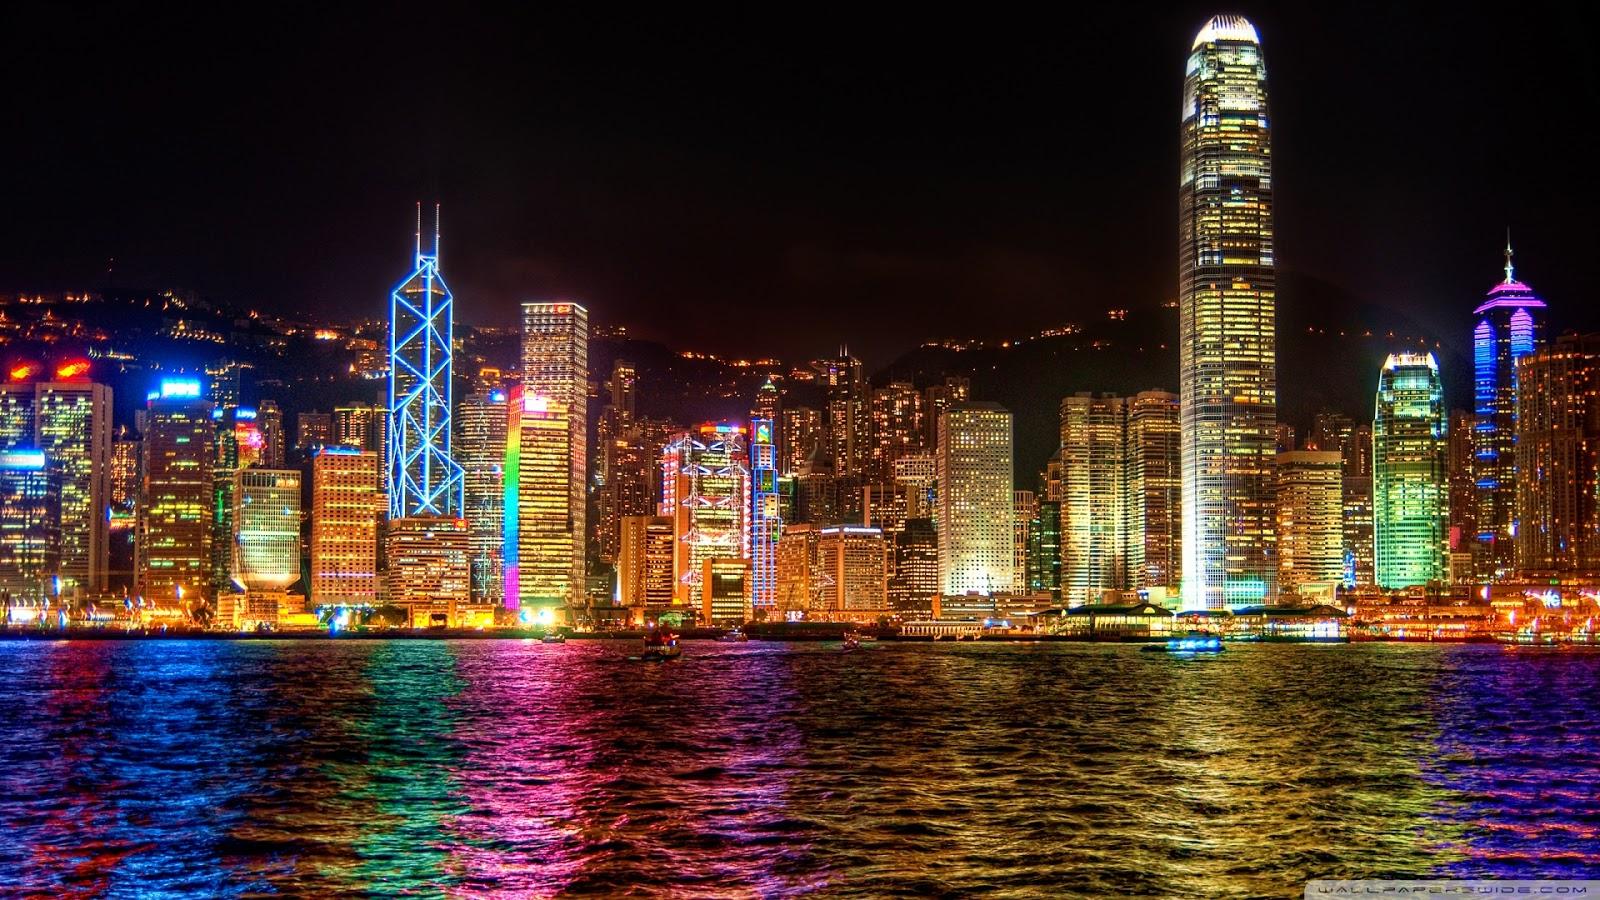 Paket Tour Hongkong Shenzhen Macau Promo ~ Cheria Wisata